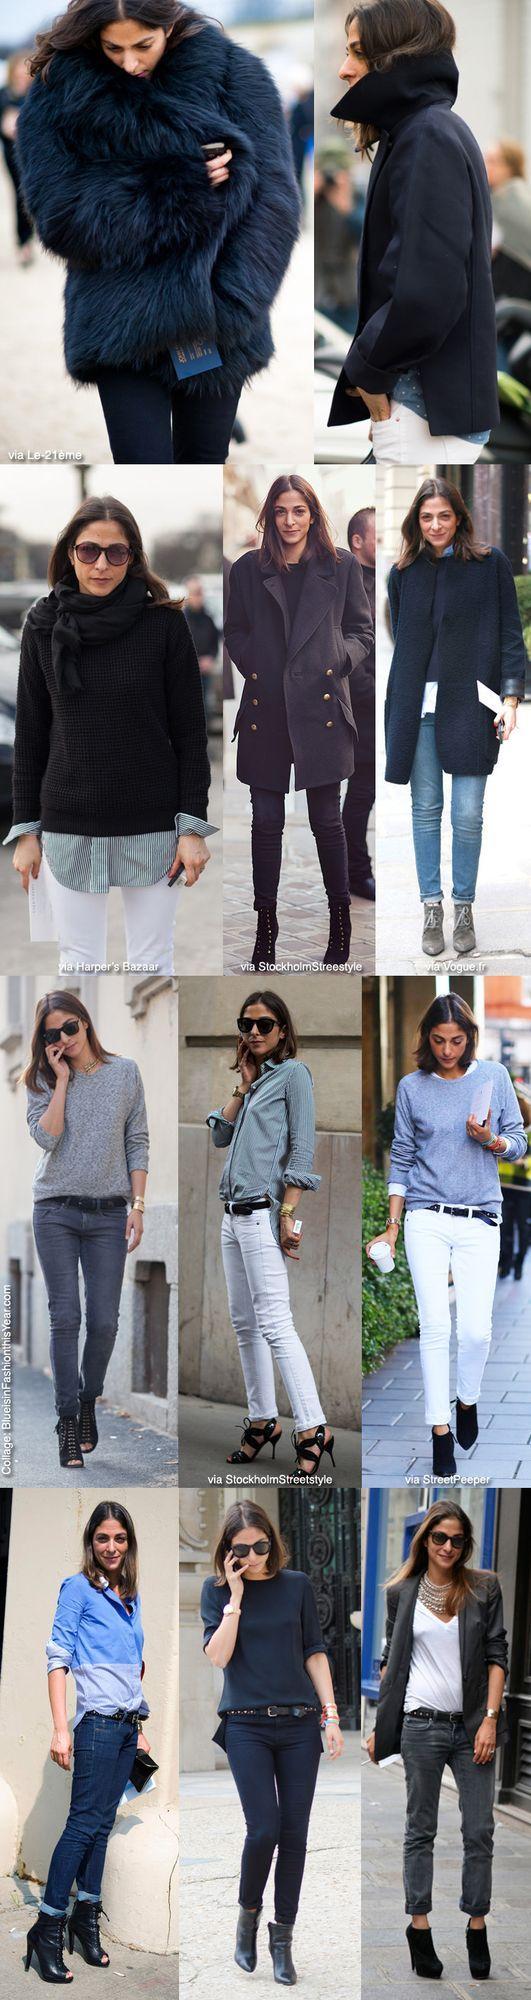 Photos via:  le21eme (1,2), harpersbazaar, stockholmstreetstyle (4,7), vogue.fr, streetpeeper  + unknown Capucine Safyurtlu Fashion & Market Editor of Vogue Paris. Parisian minimalism as its best. On